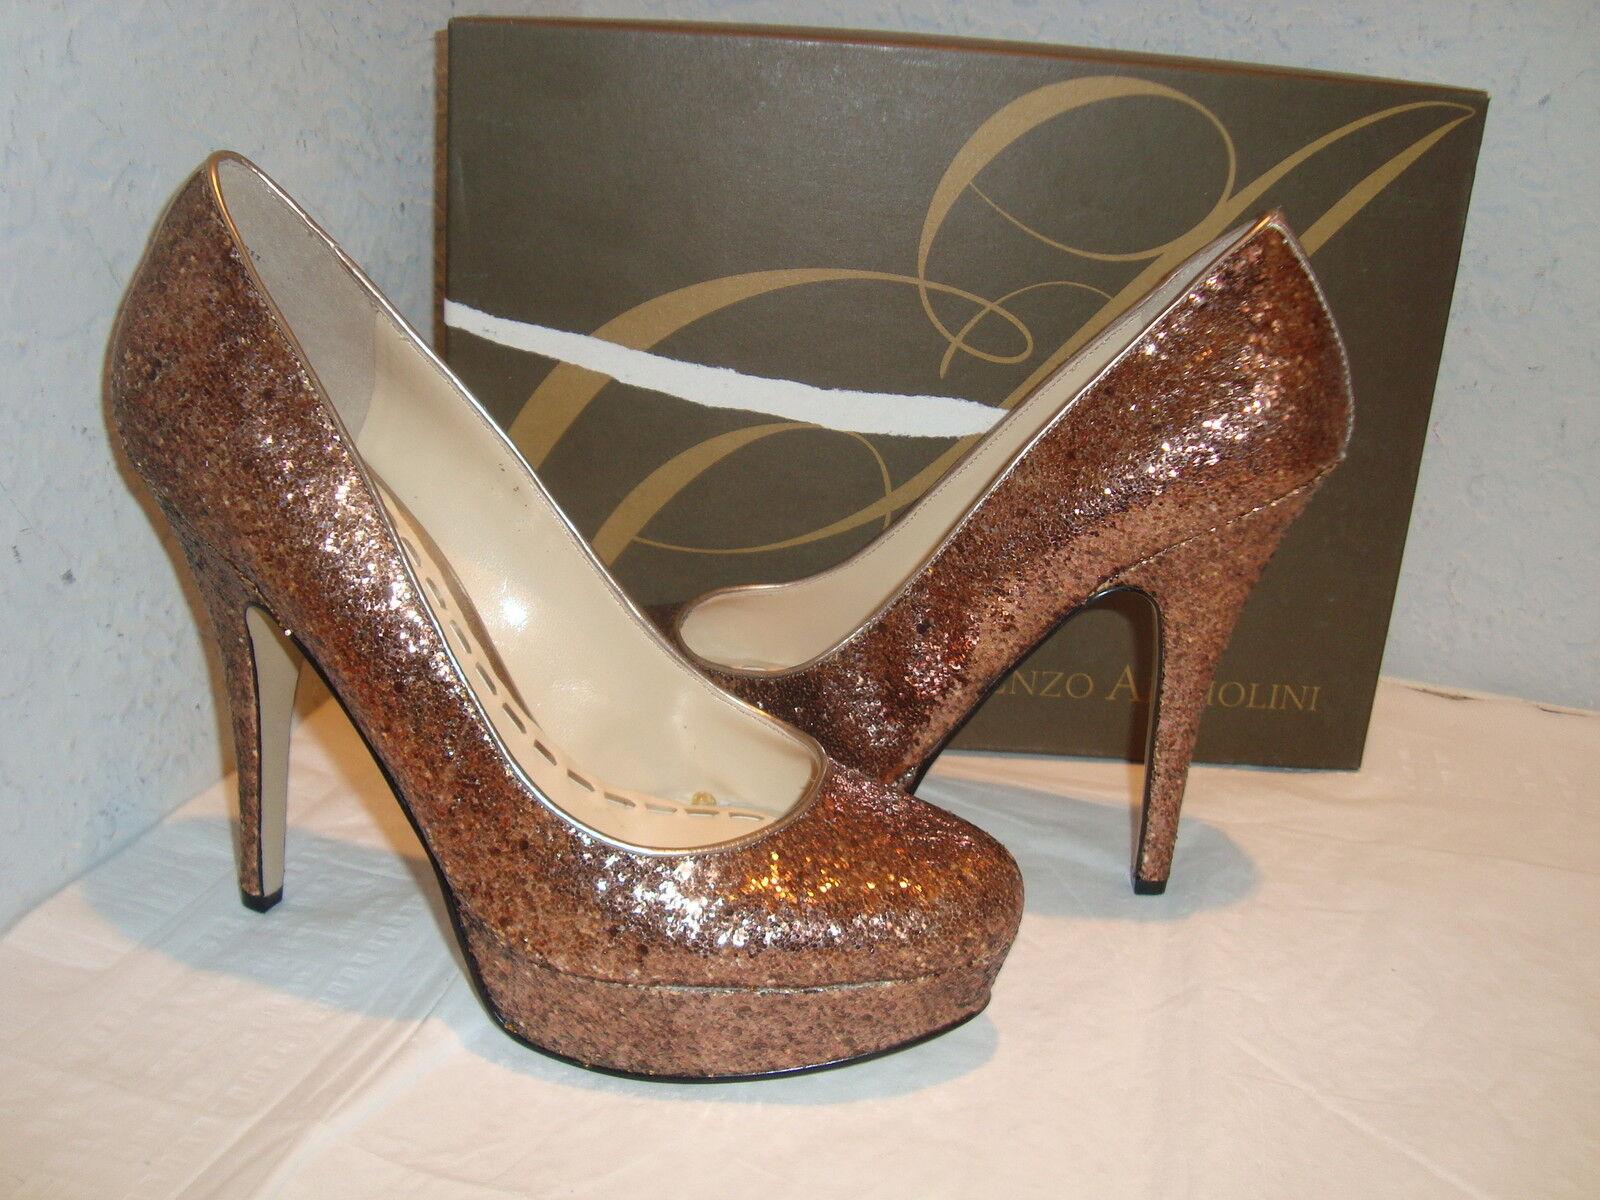 NEU Enzo Angiolini Damenschuhe Smiles Gold Heels Schuhes Größe 6 Medium